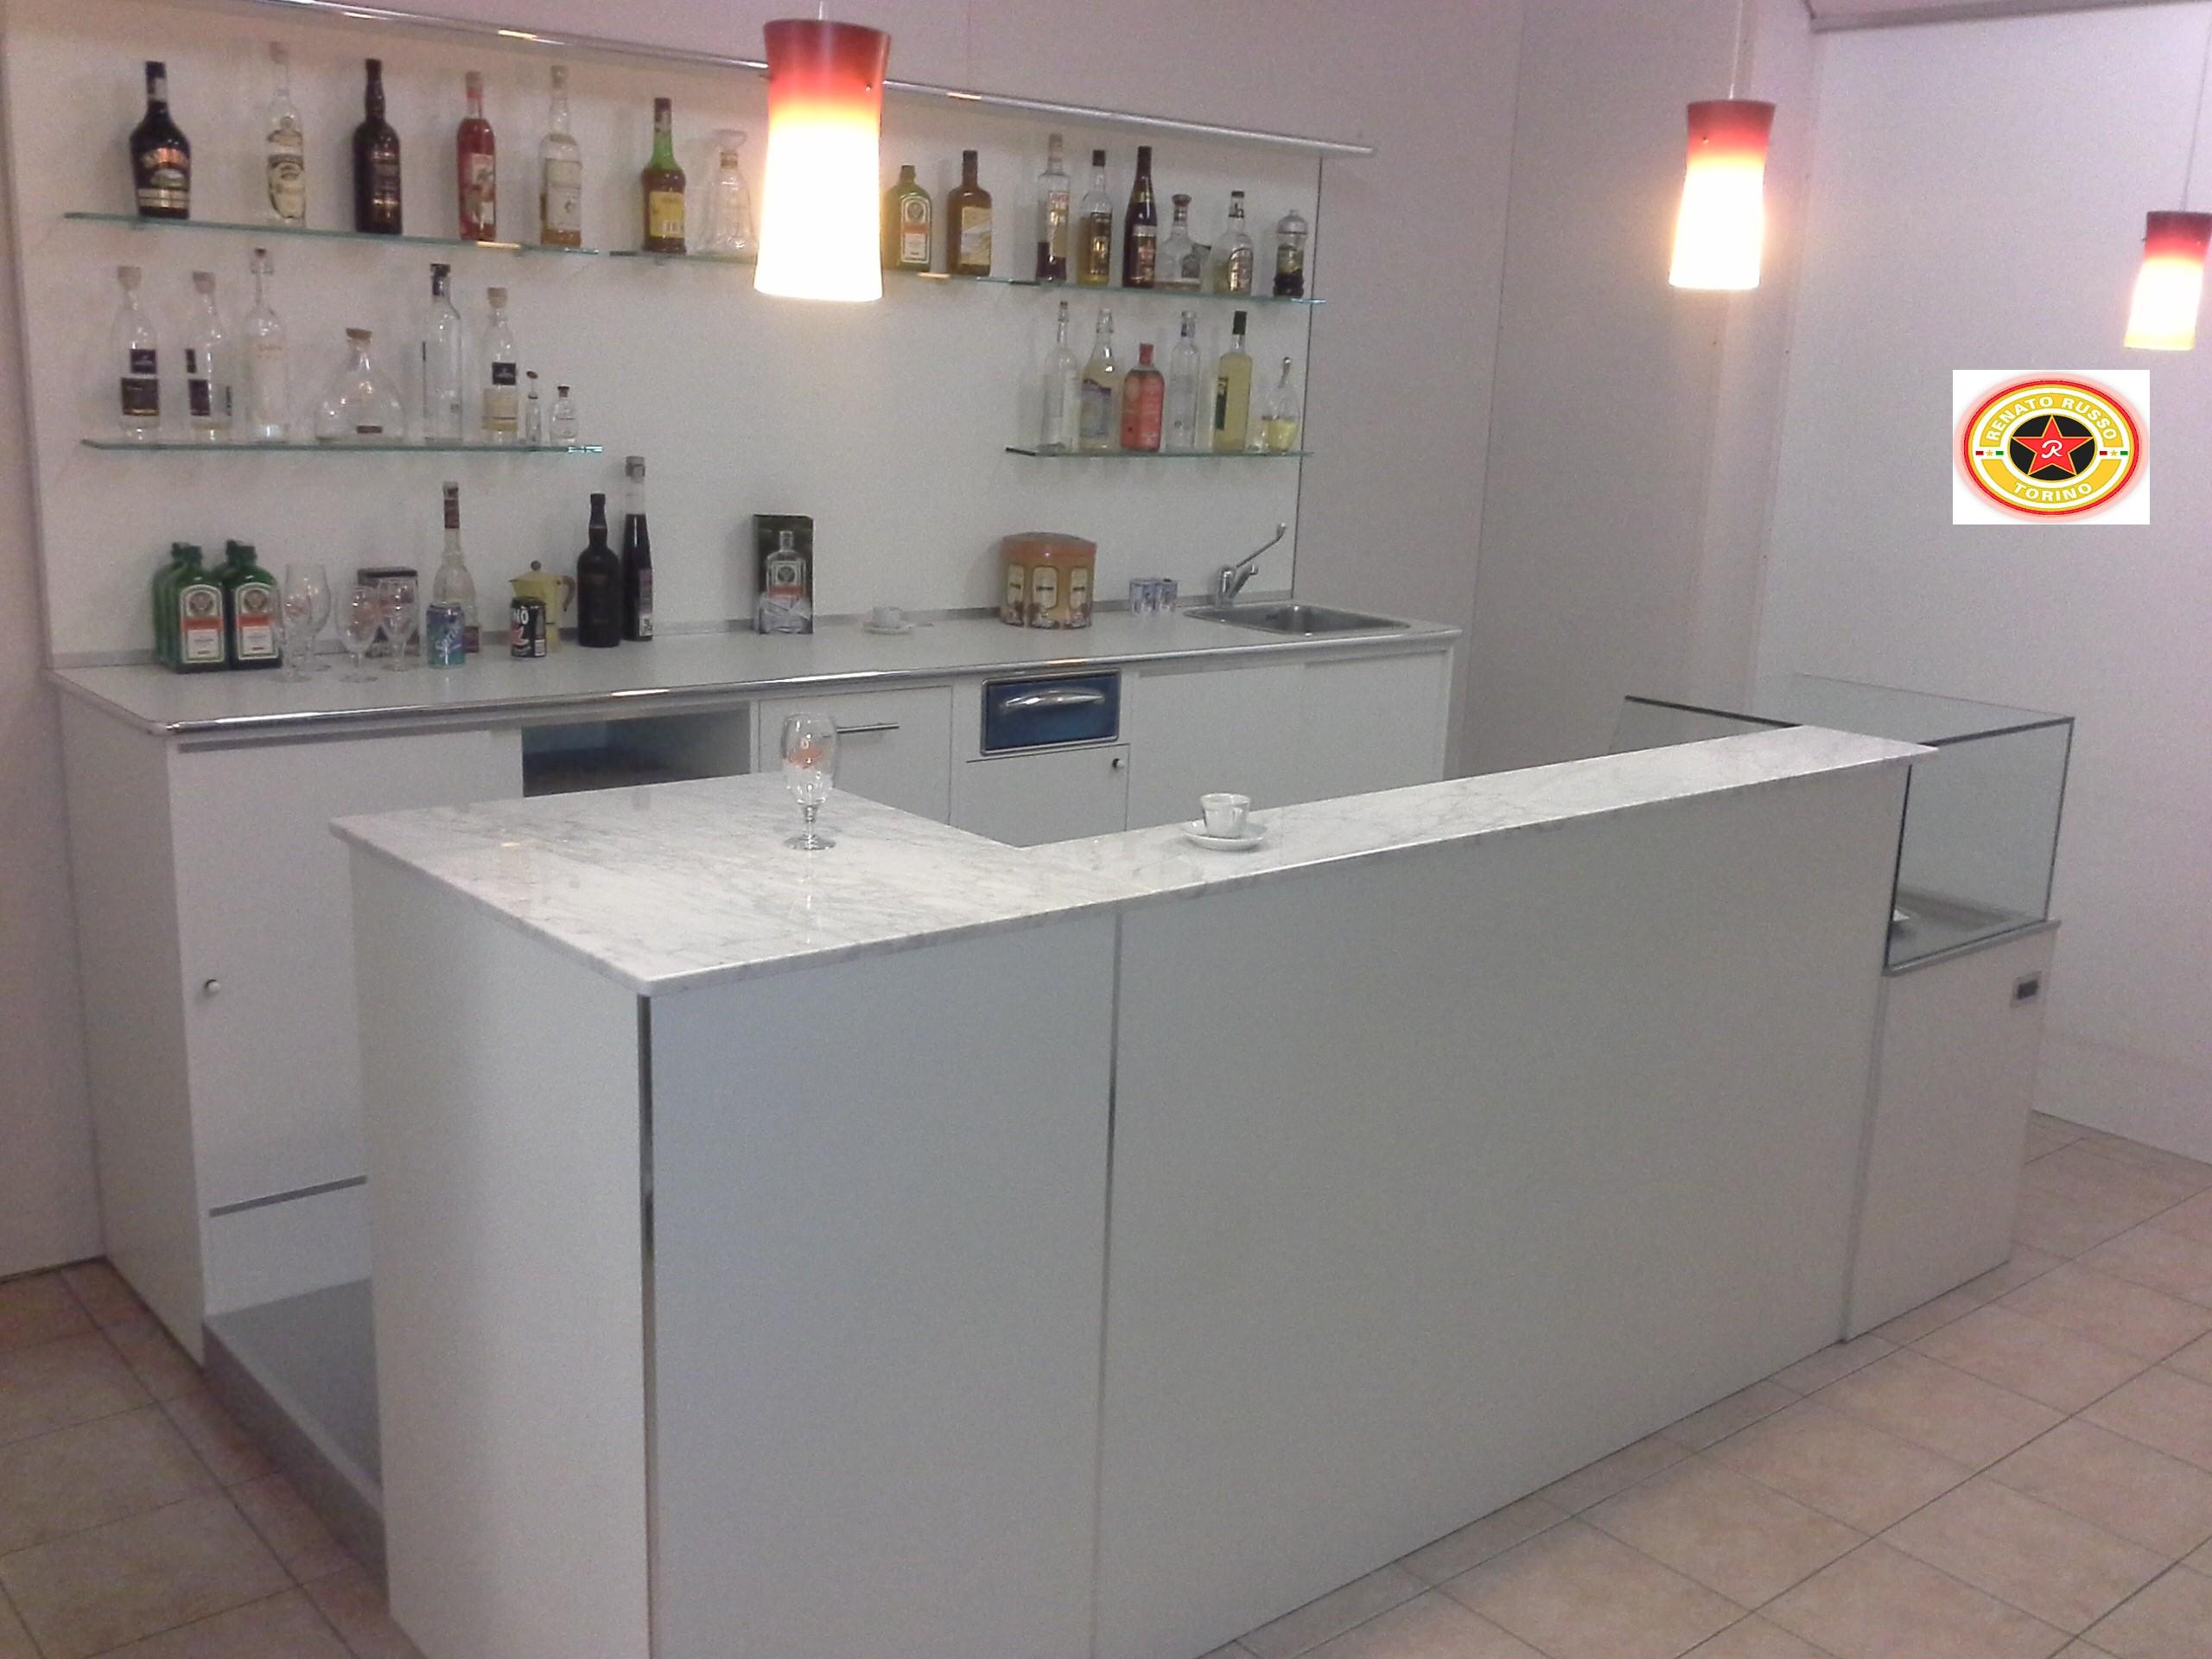 Banchi bar compra in fabbrica a met prezzo novit bar - Mobile frigo incasso ...